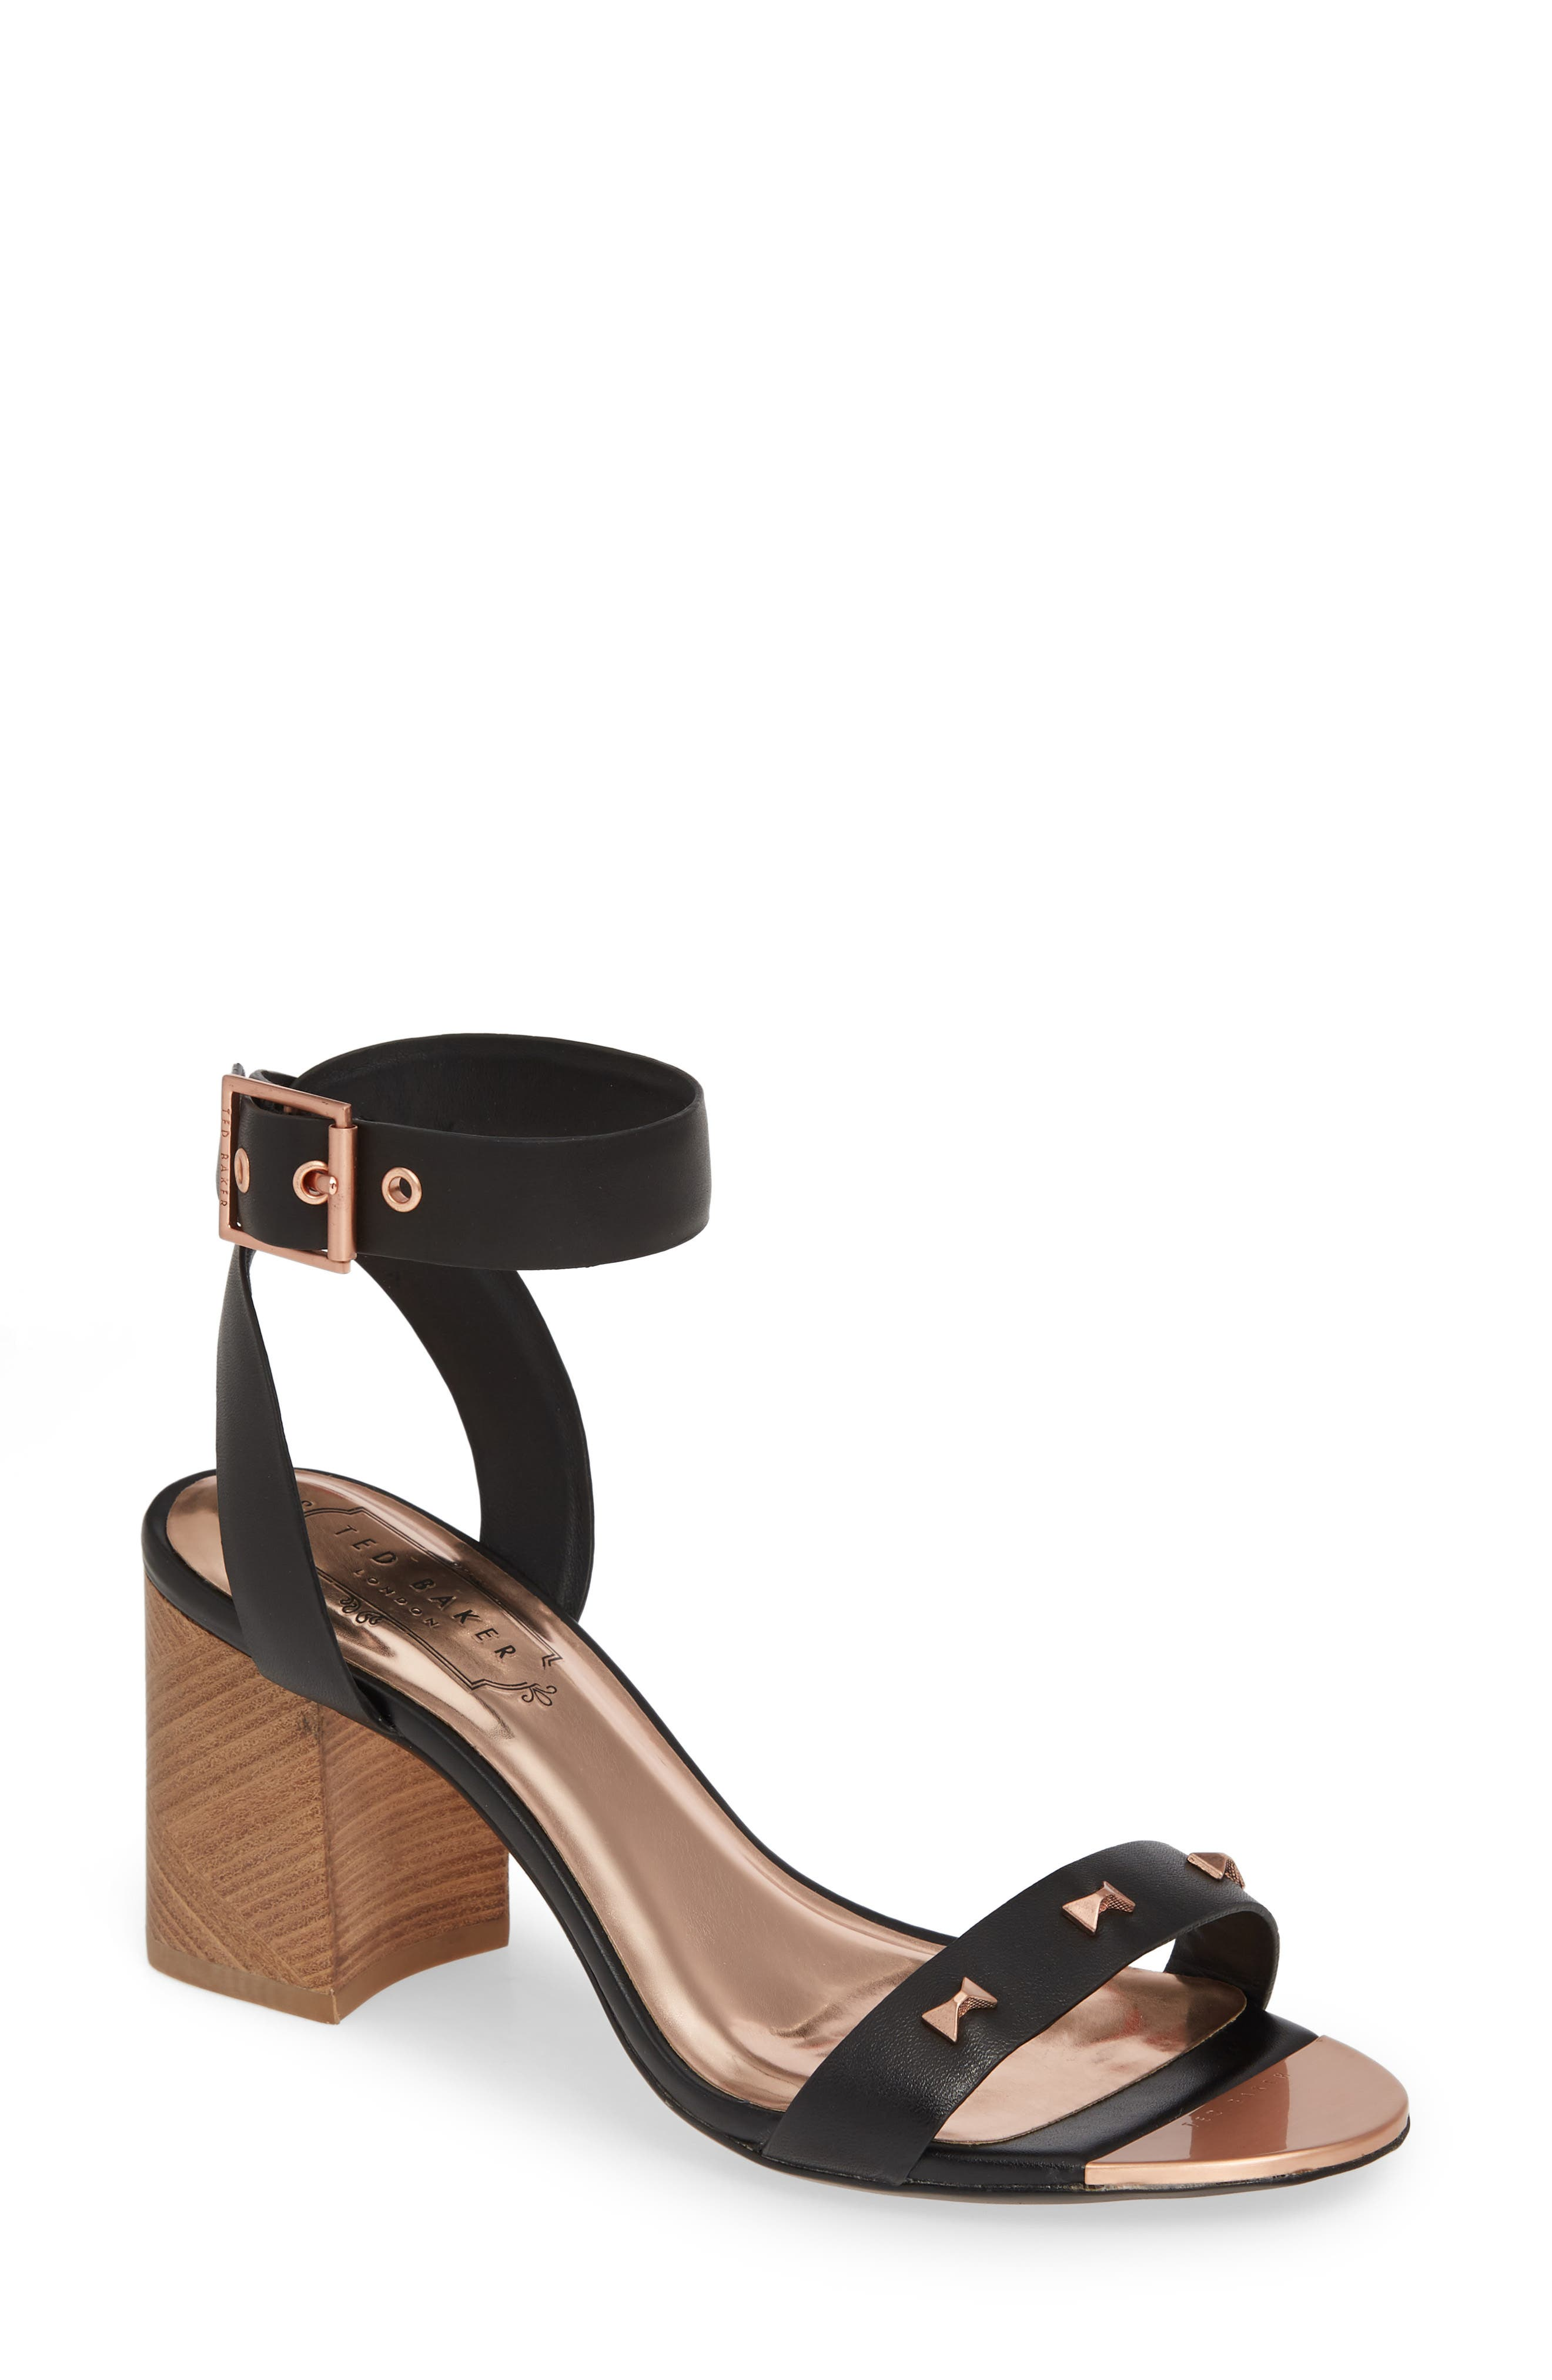 6ac3c851c7d6 Women s Ted Baker London Heeled Sandals